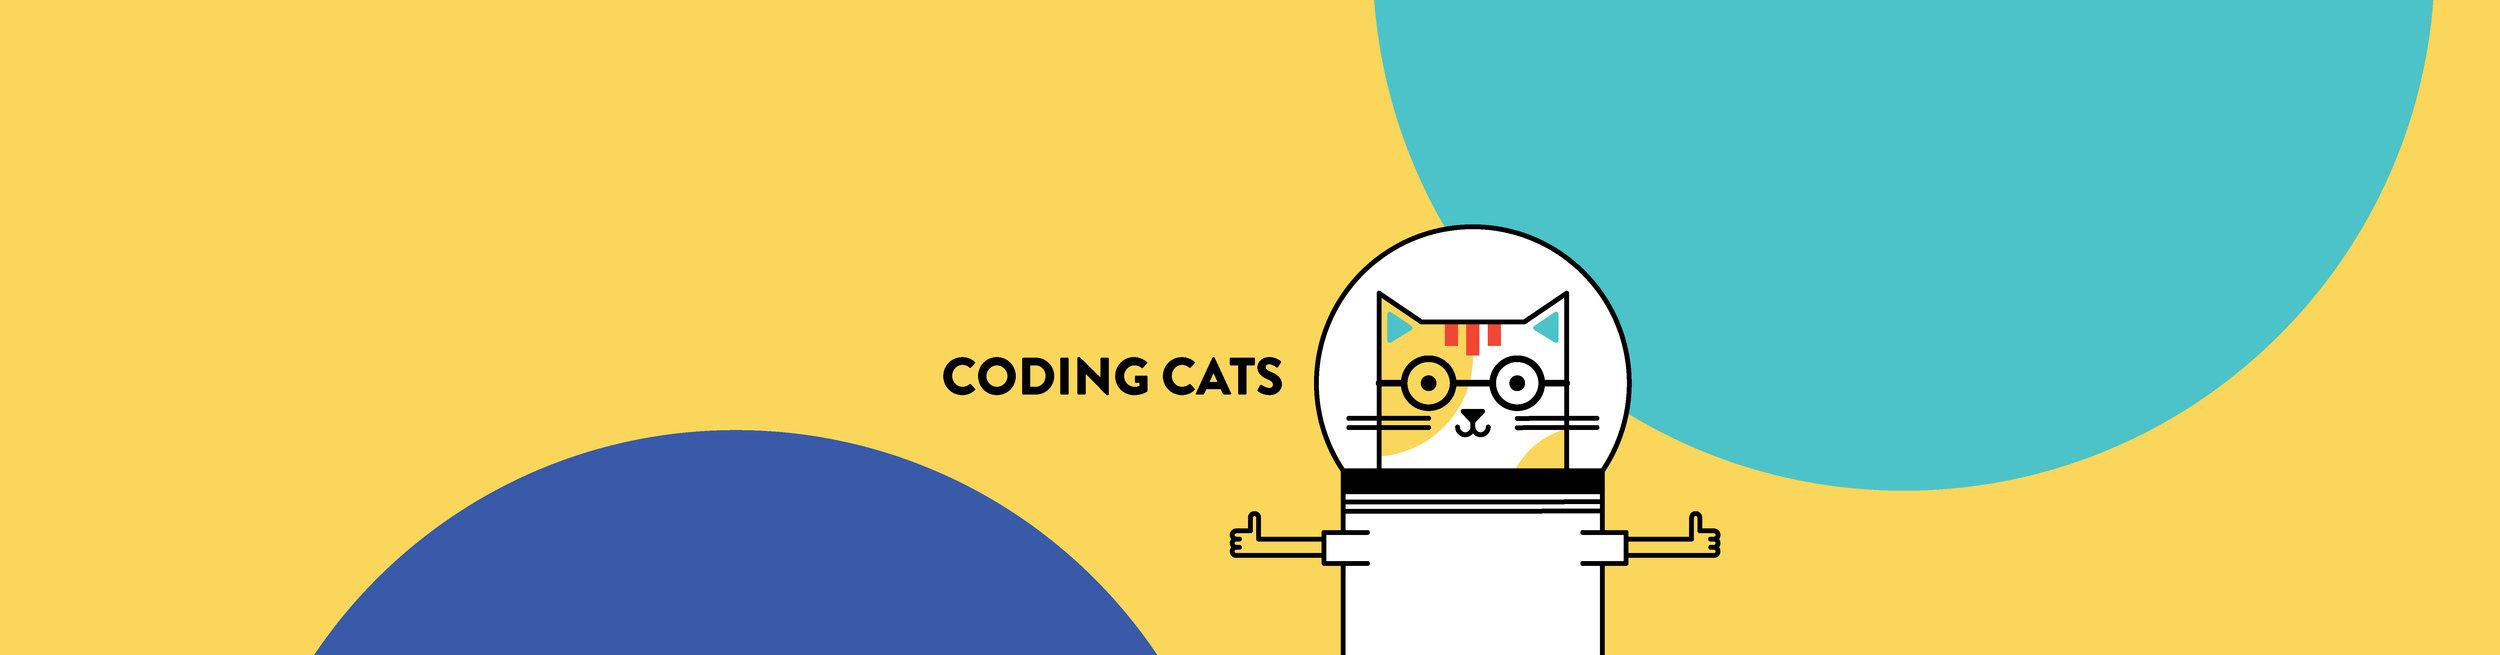 Coding Cats — Raintree Cambodia